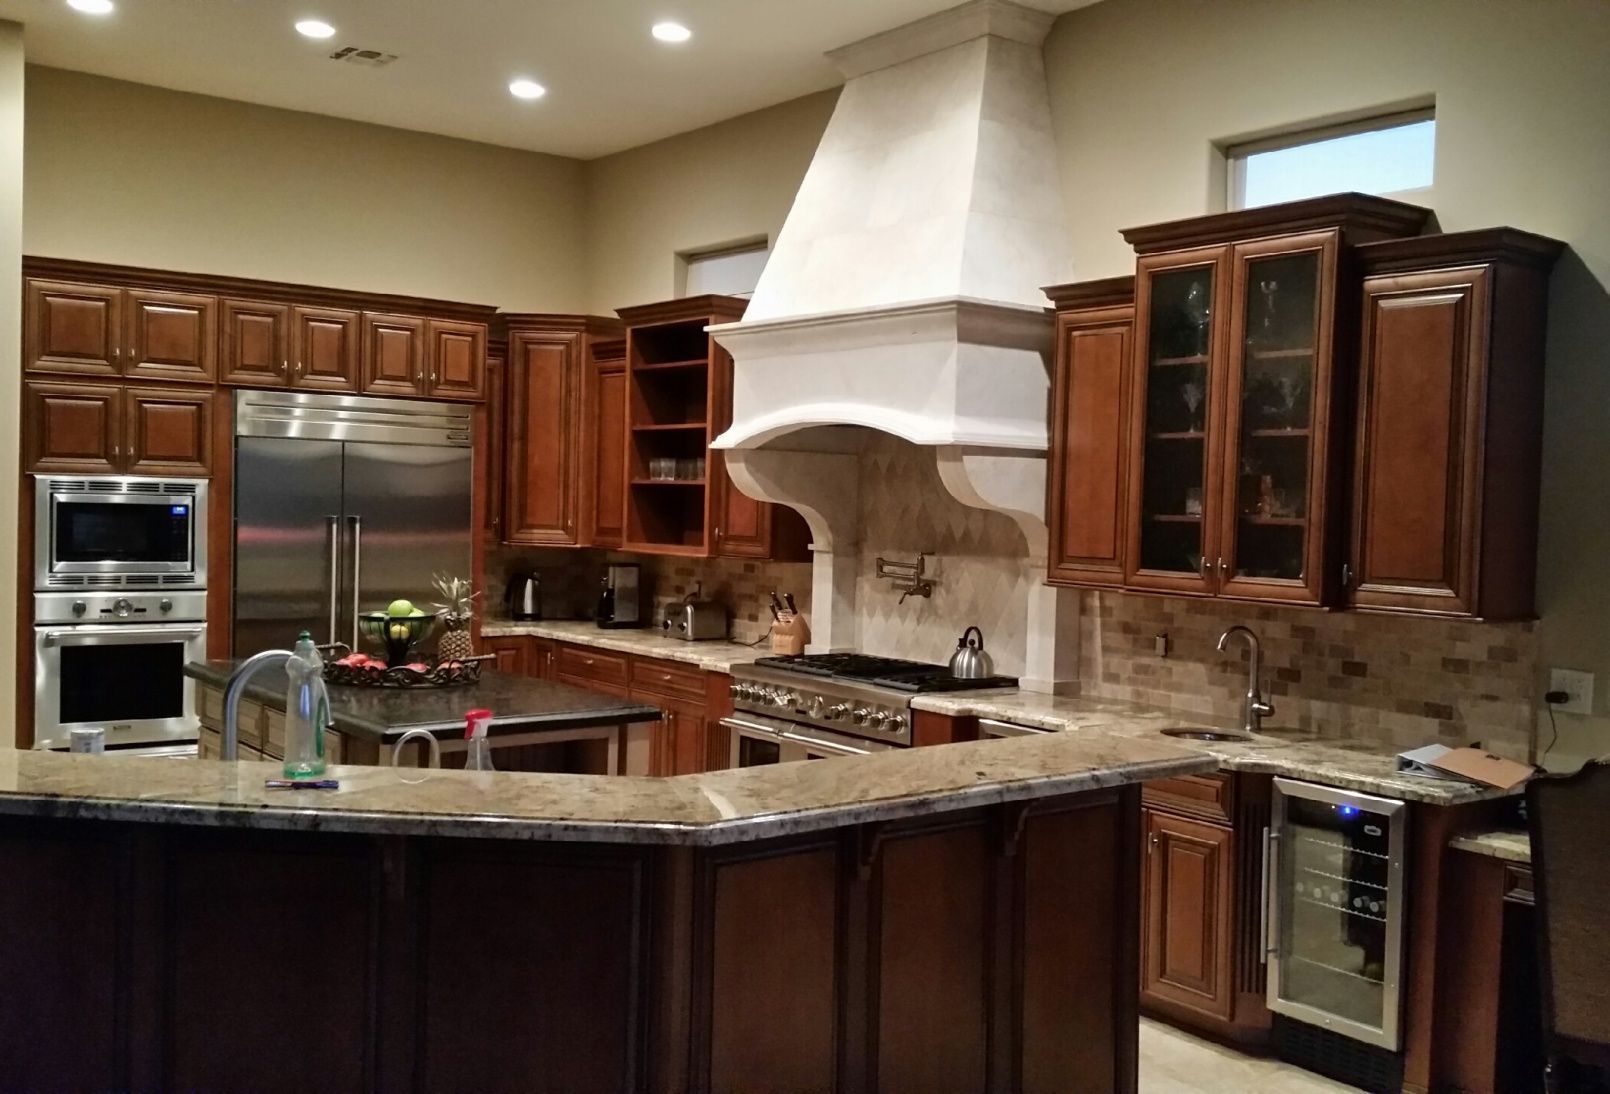 Phoenix Kitchen Bath Cabinets Home Remodeling Contractor House Design Kitchen Kitchen Cabinet Remodel Kitchen Design